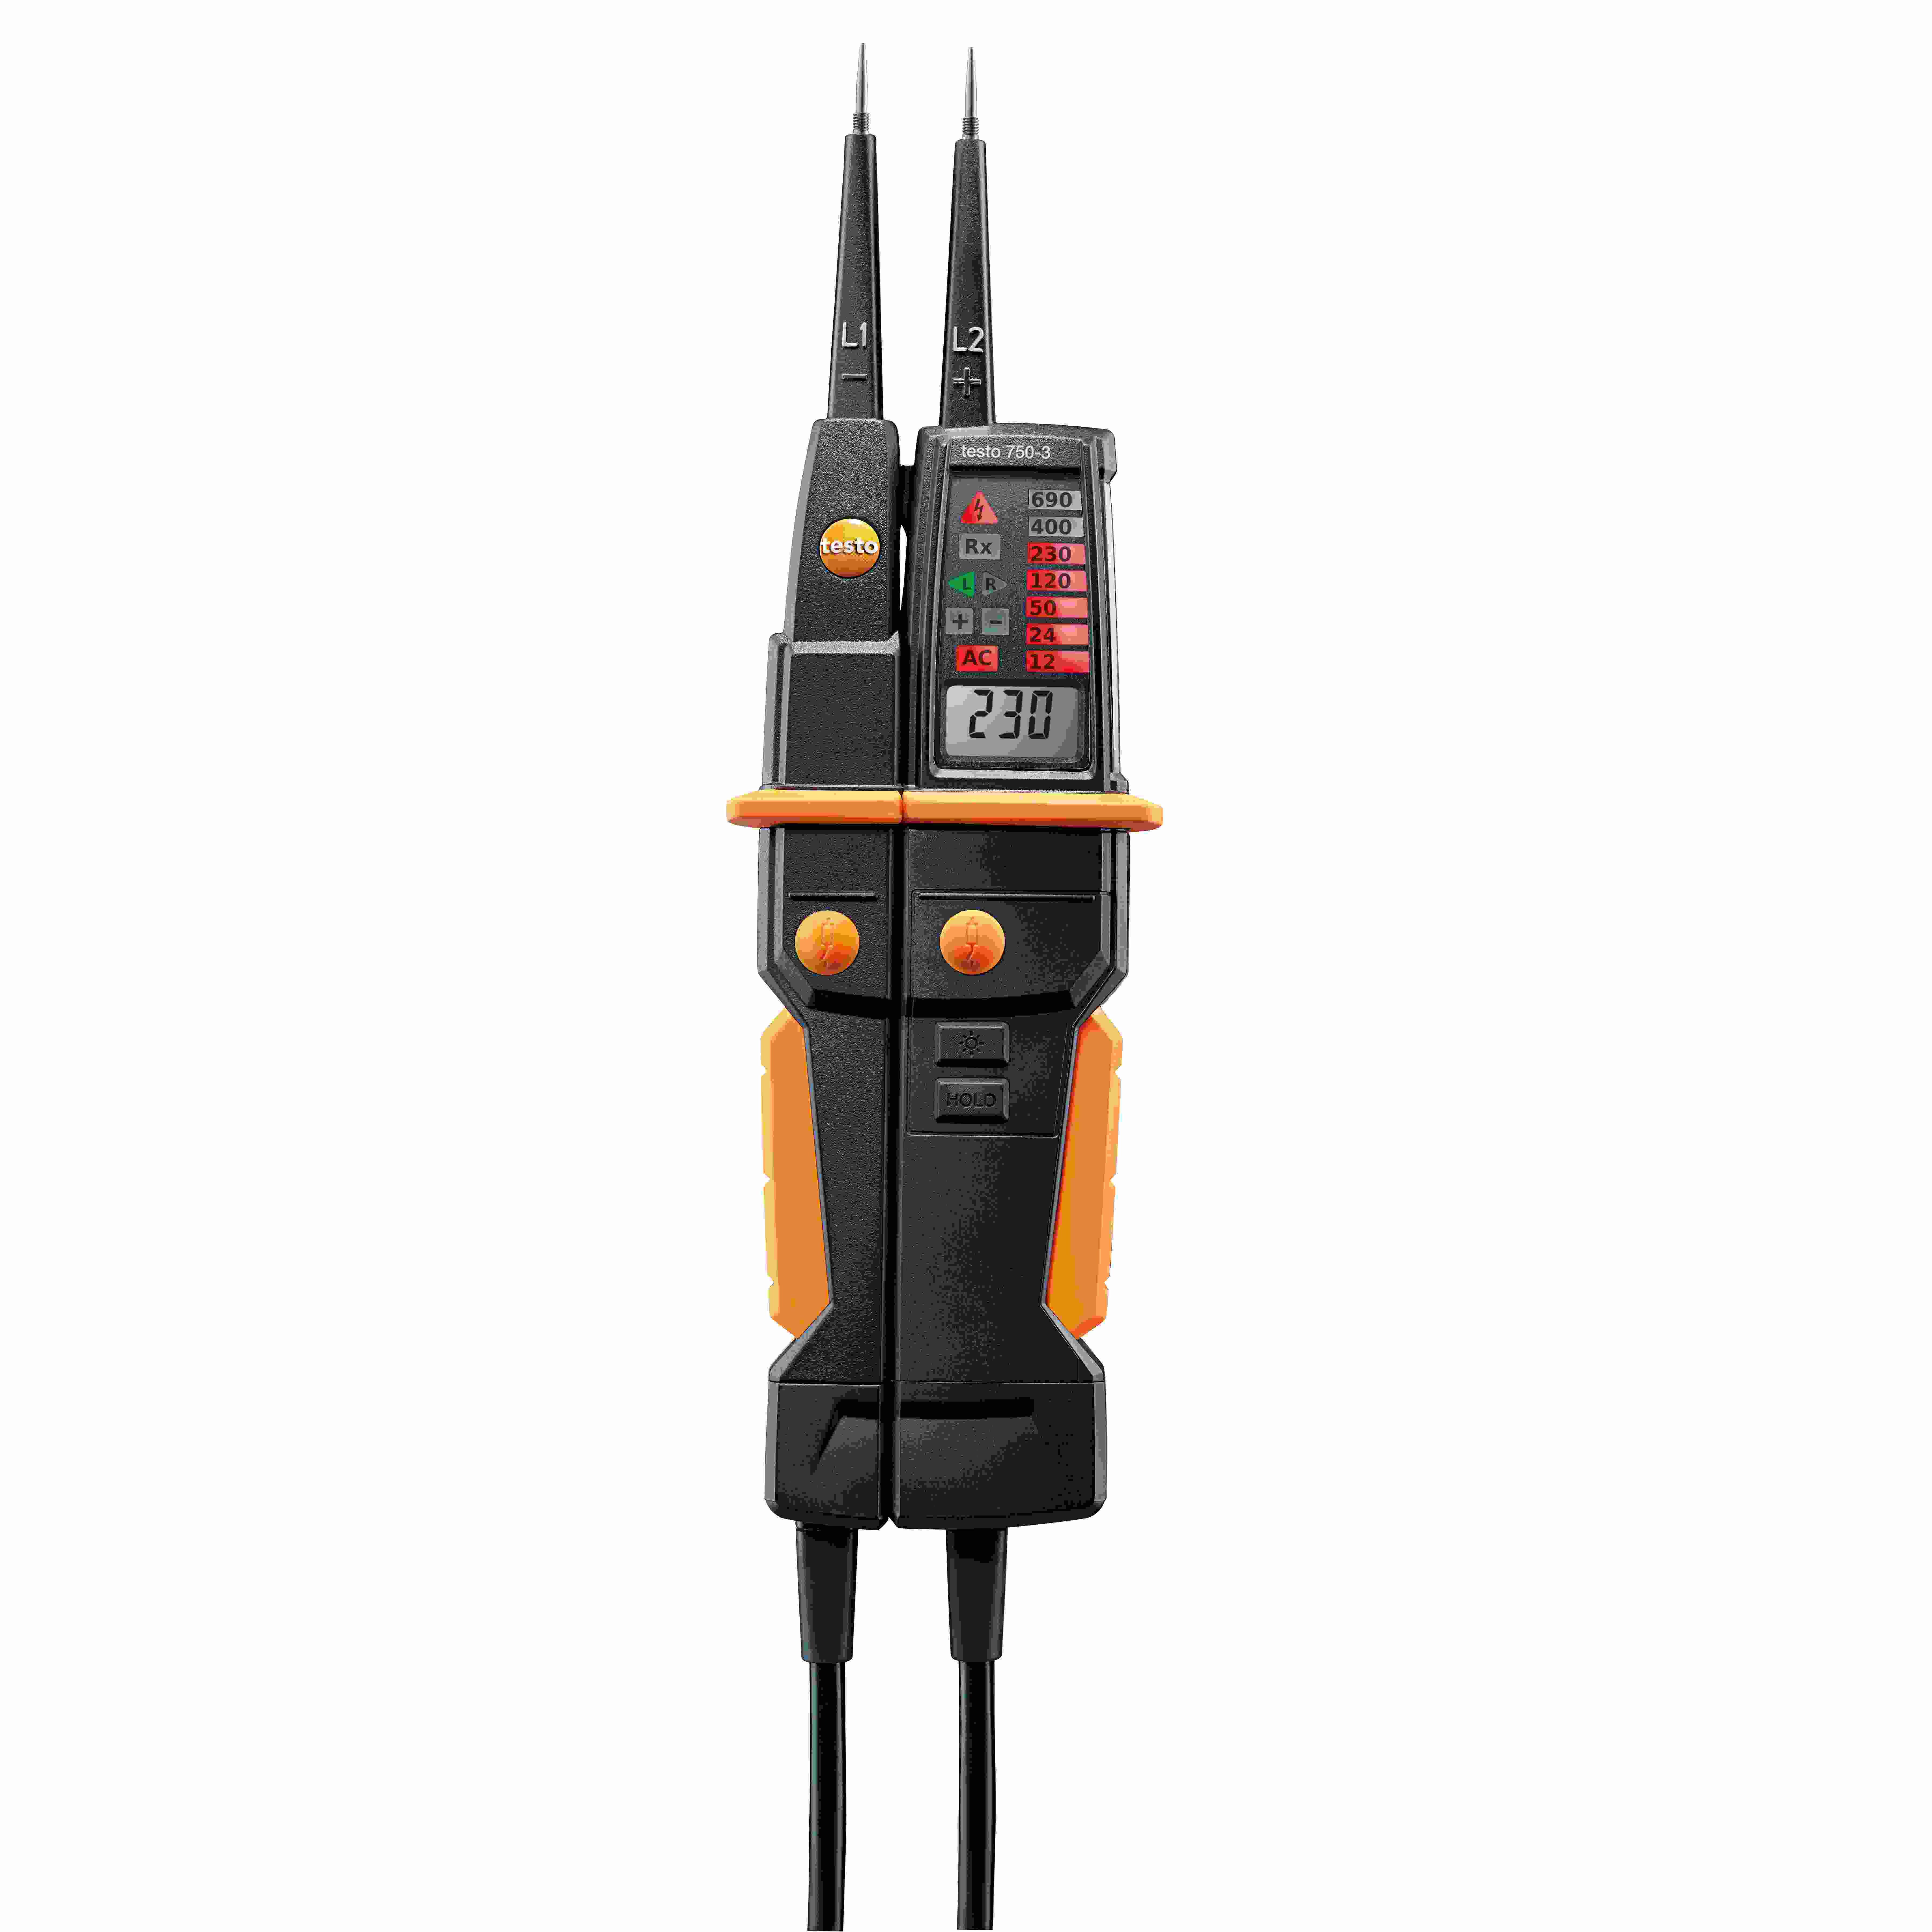 testo-750-3-voltage-tester-free-front